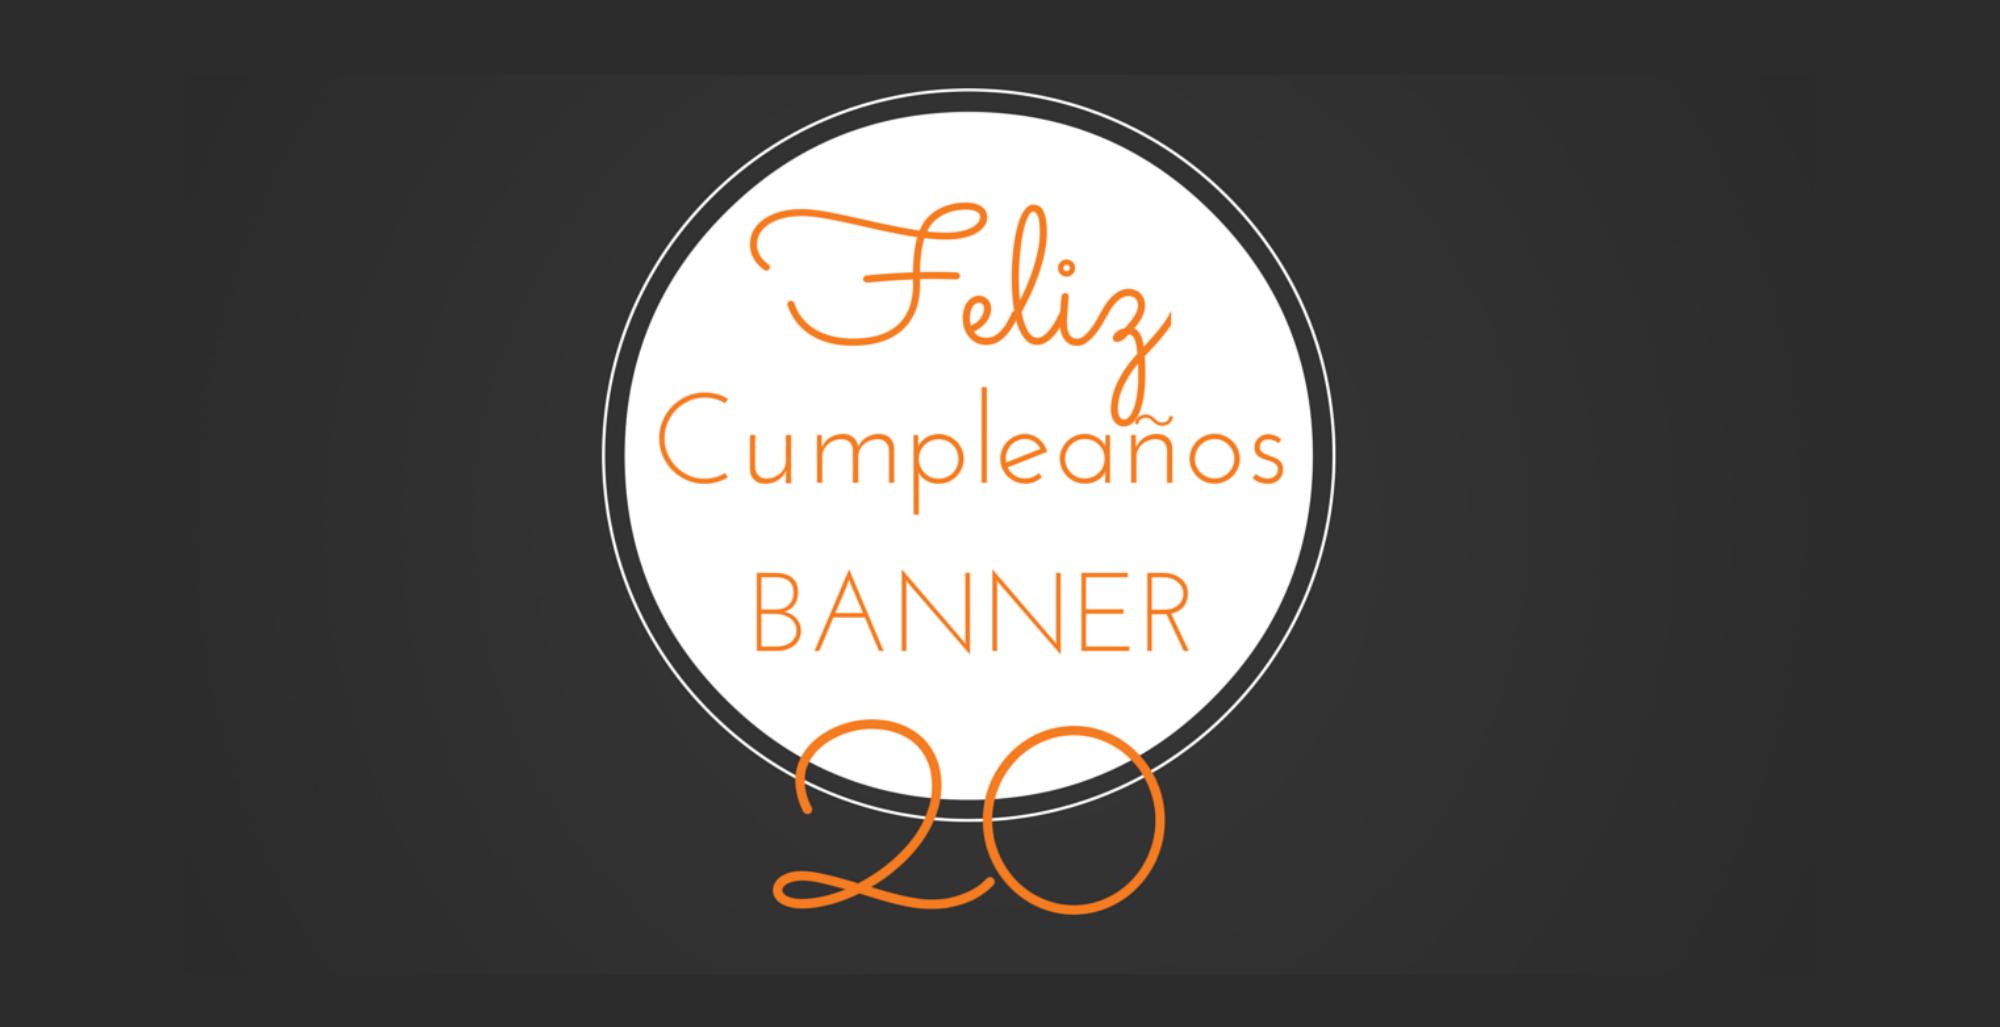 Banner Feliz Aniversario: ¡Feliz Aniversario Banner